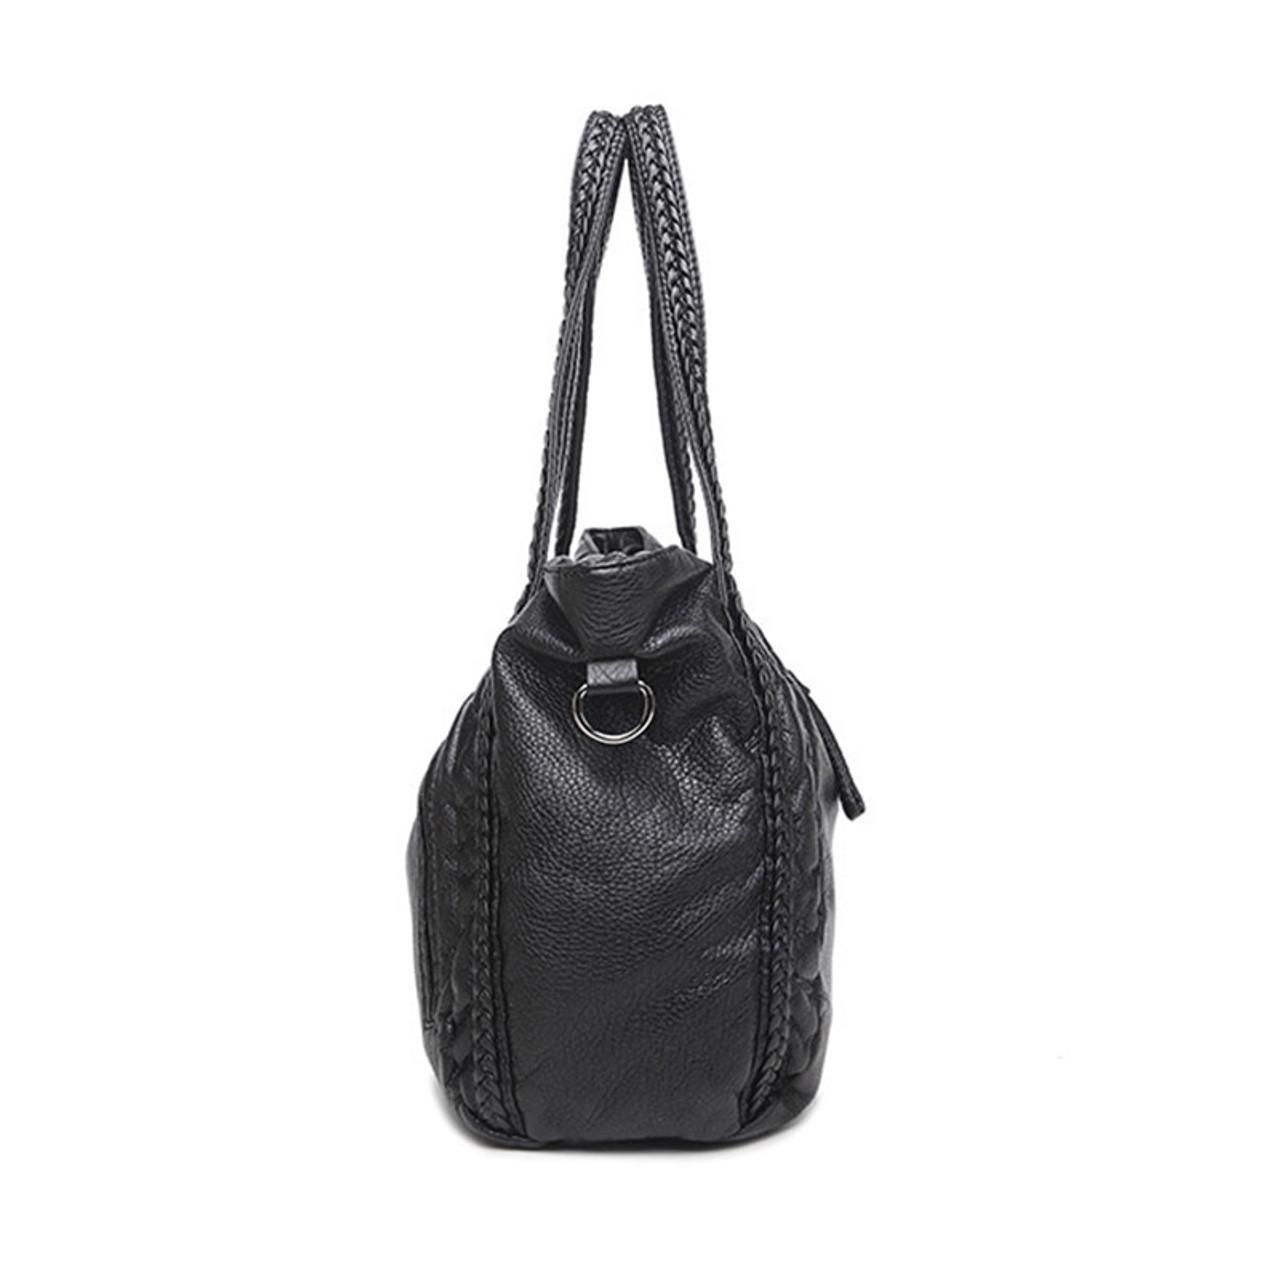 706ae458b49 ... Large Soft Leather Bag for Women Handbags Ladies Crossbody Bags Hobos Shoulder  Bags Female Big Tote ...